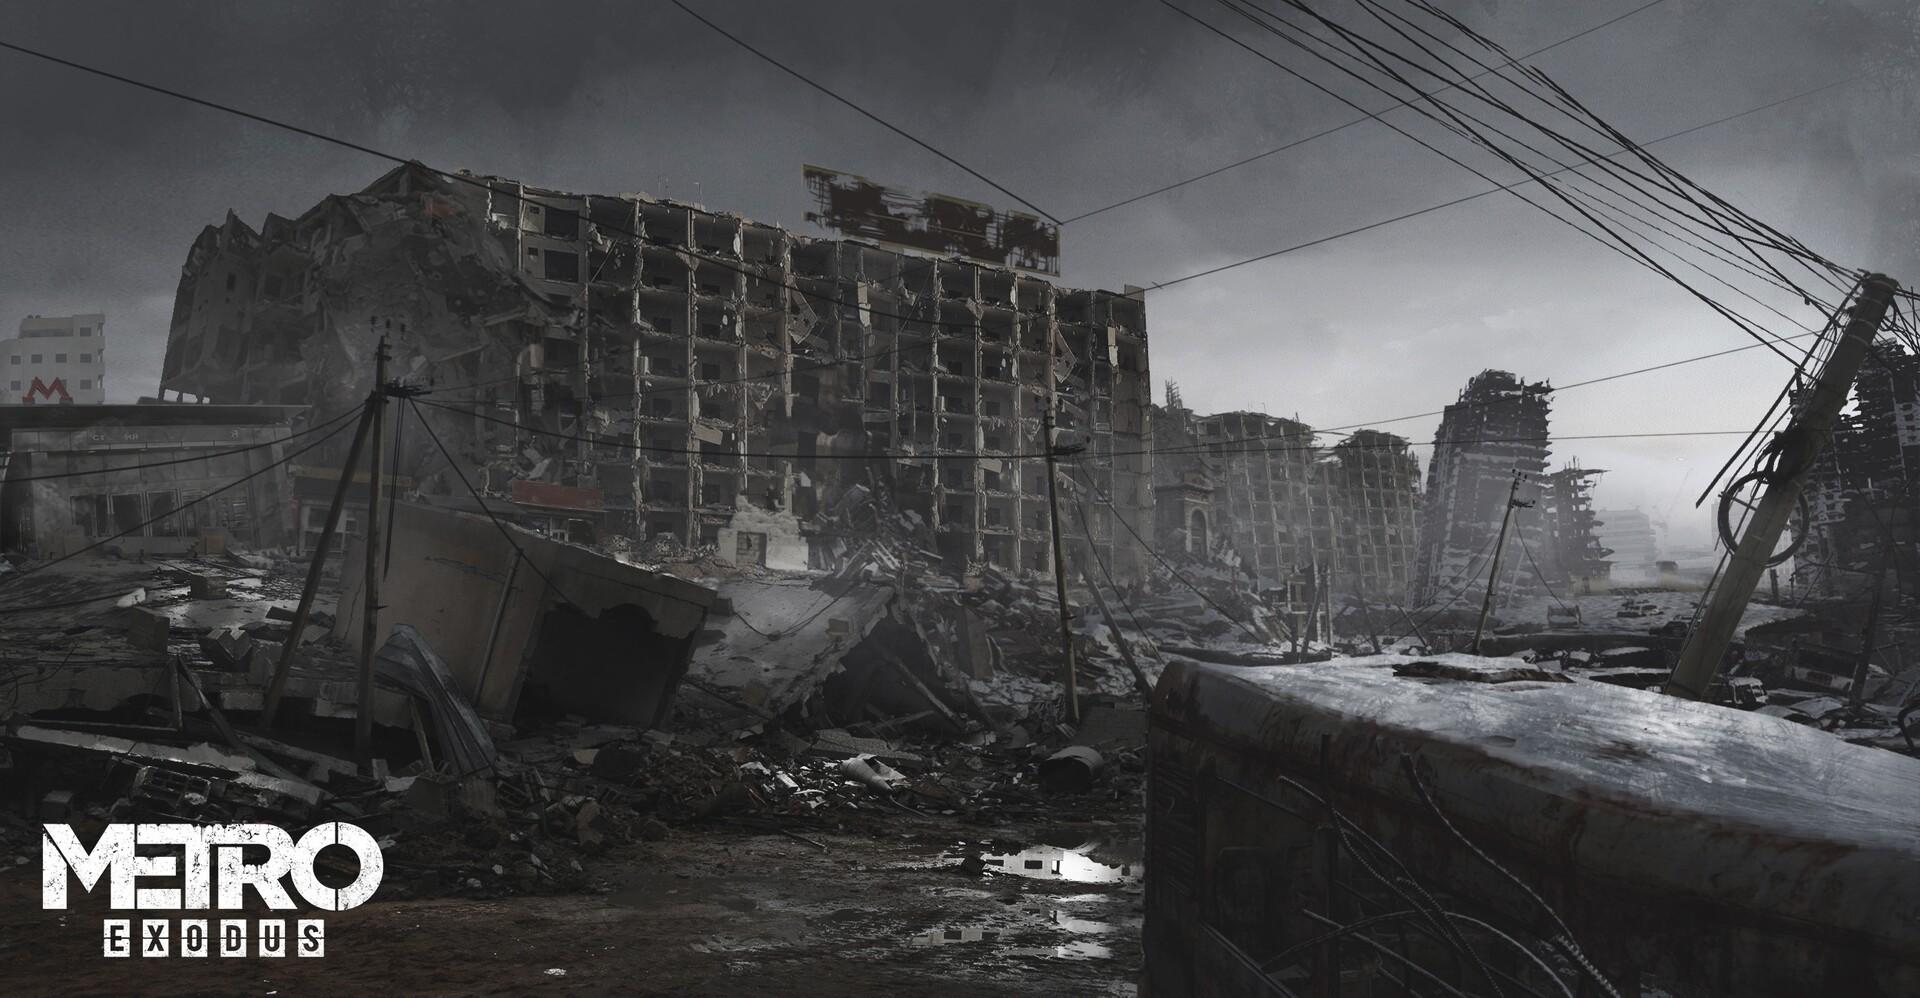 Rostyslav zagornov kbwl mjd6m0